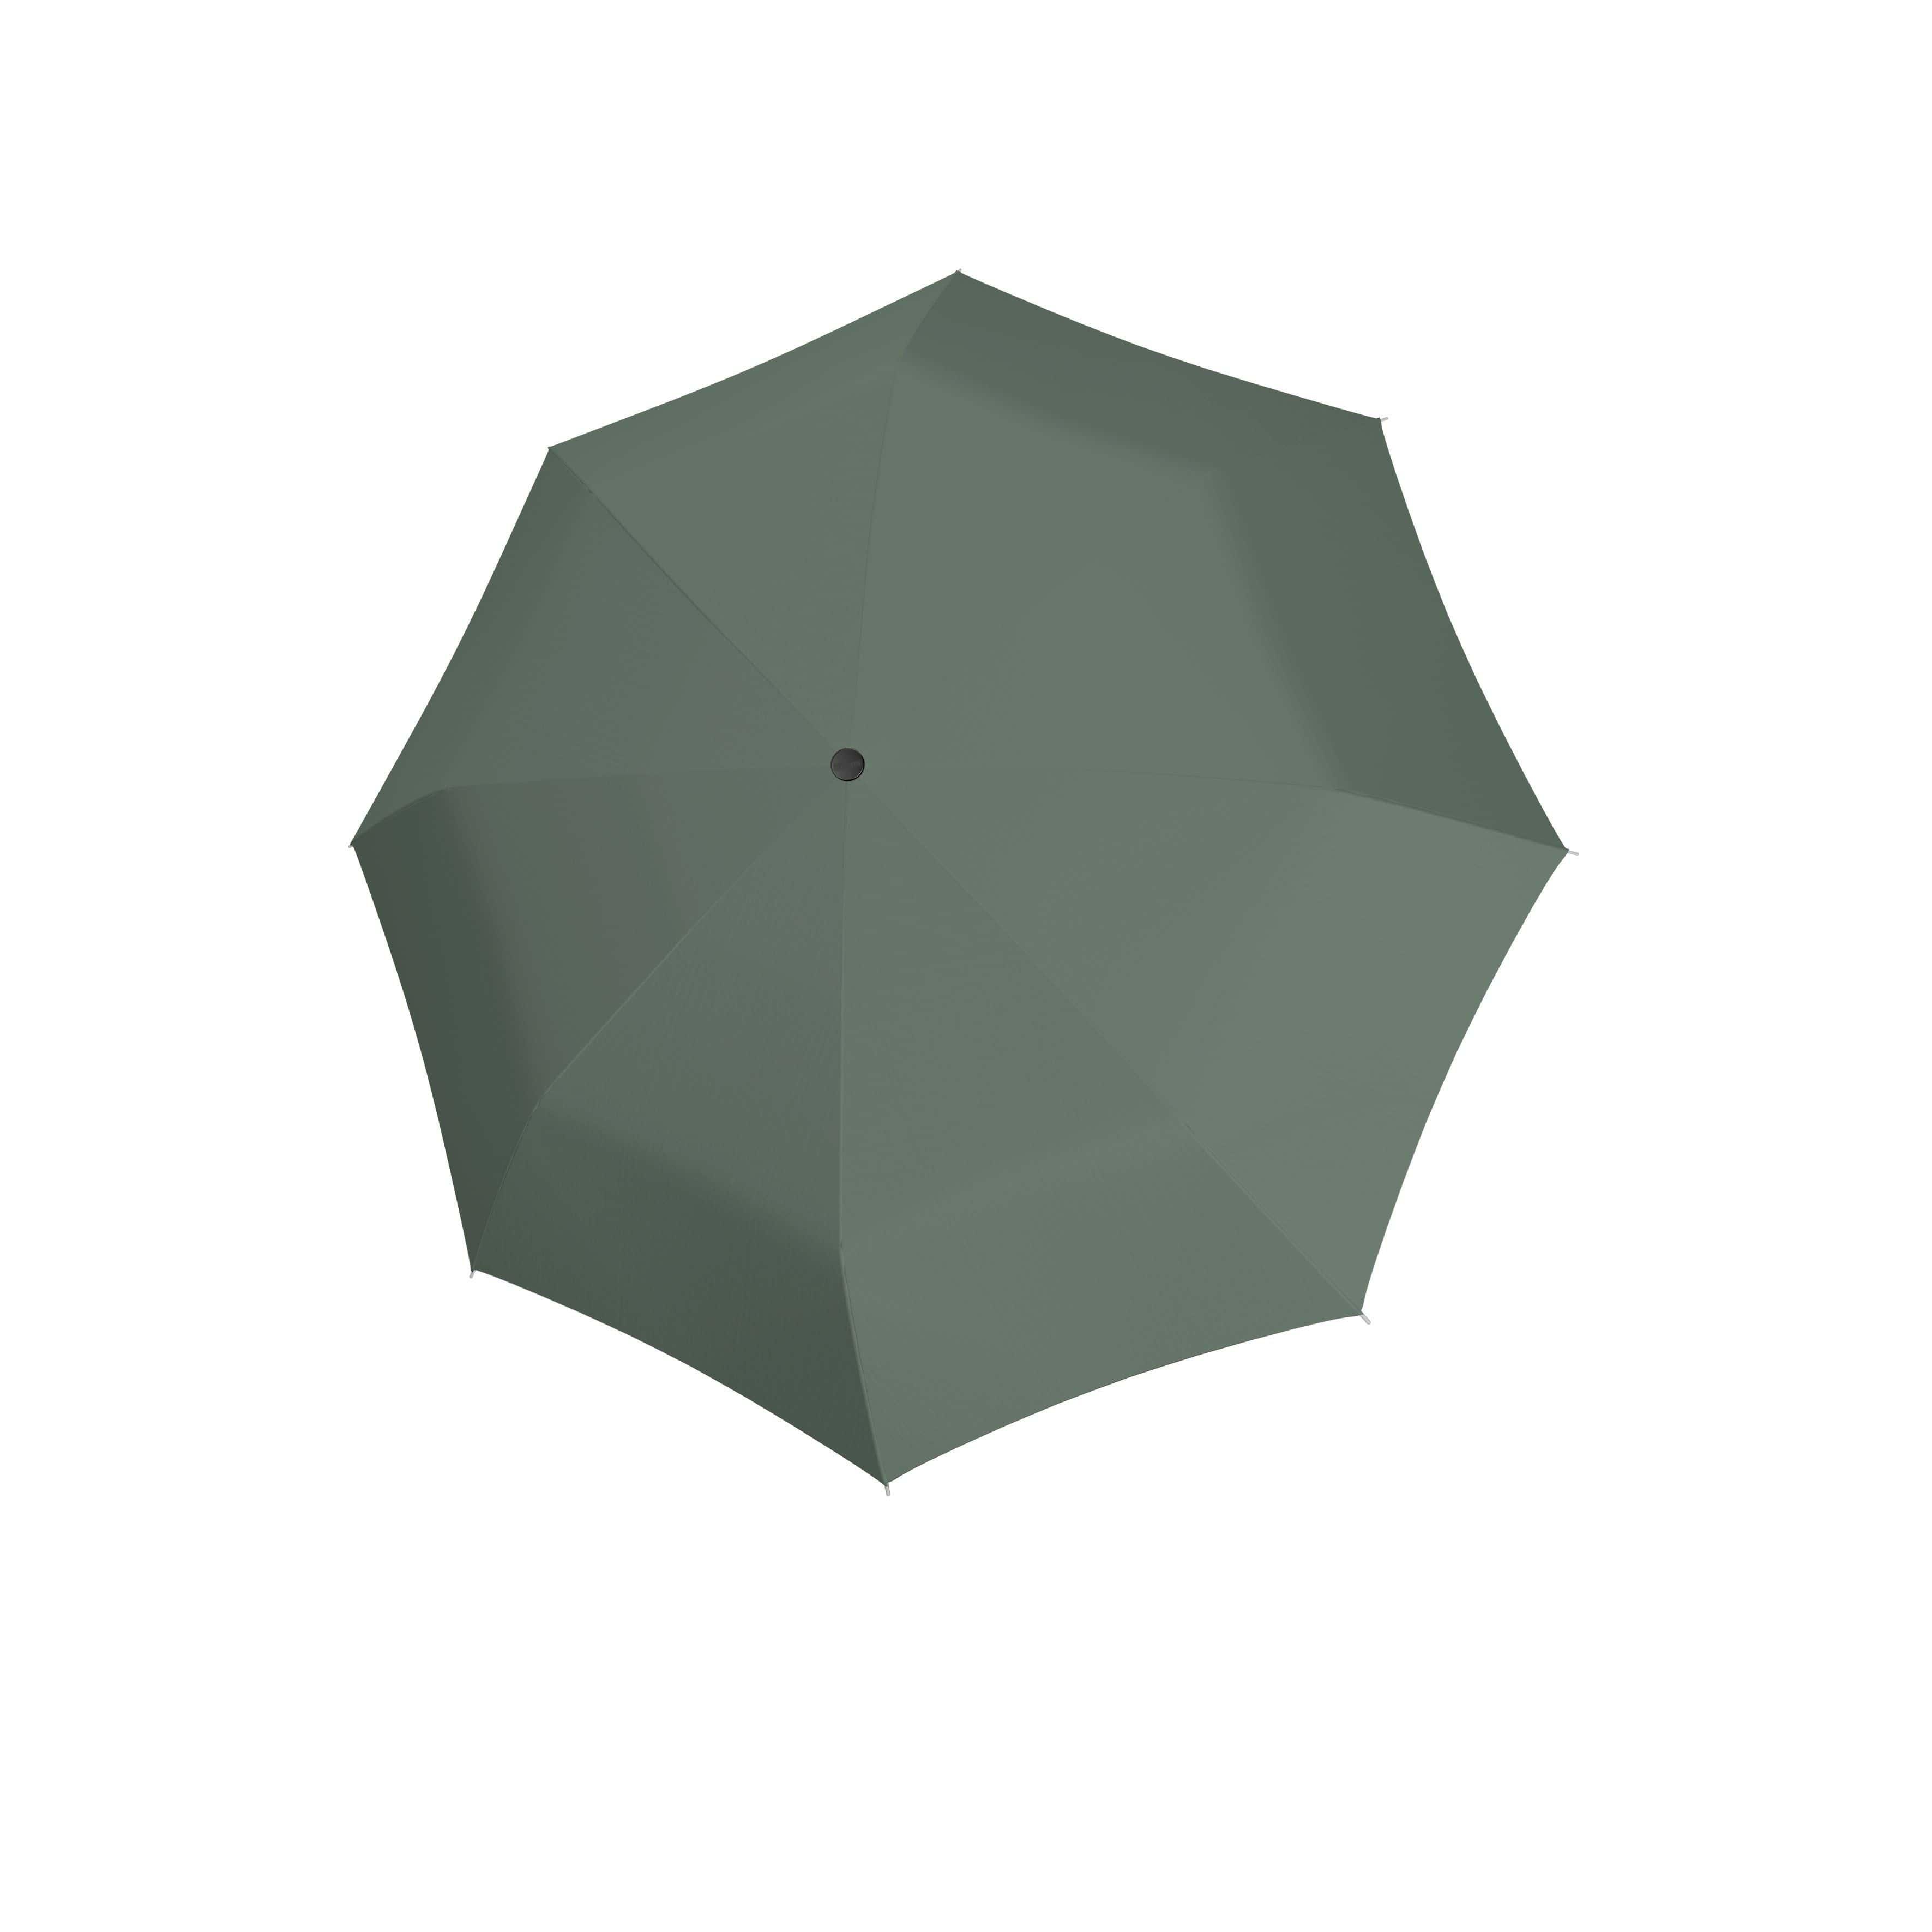 Knirps Umbrella Vision Duomatic - foto 2